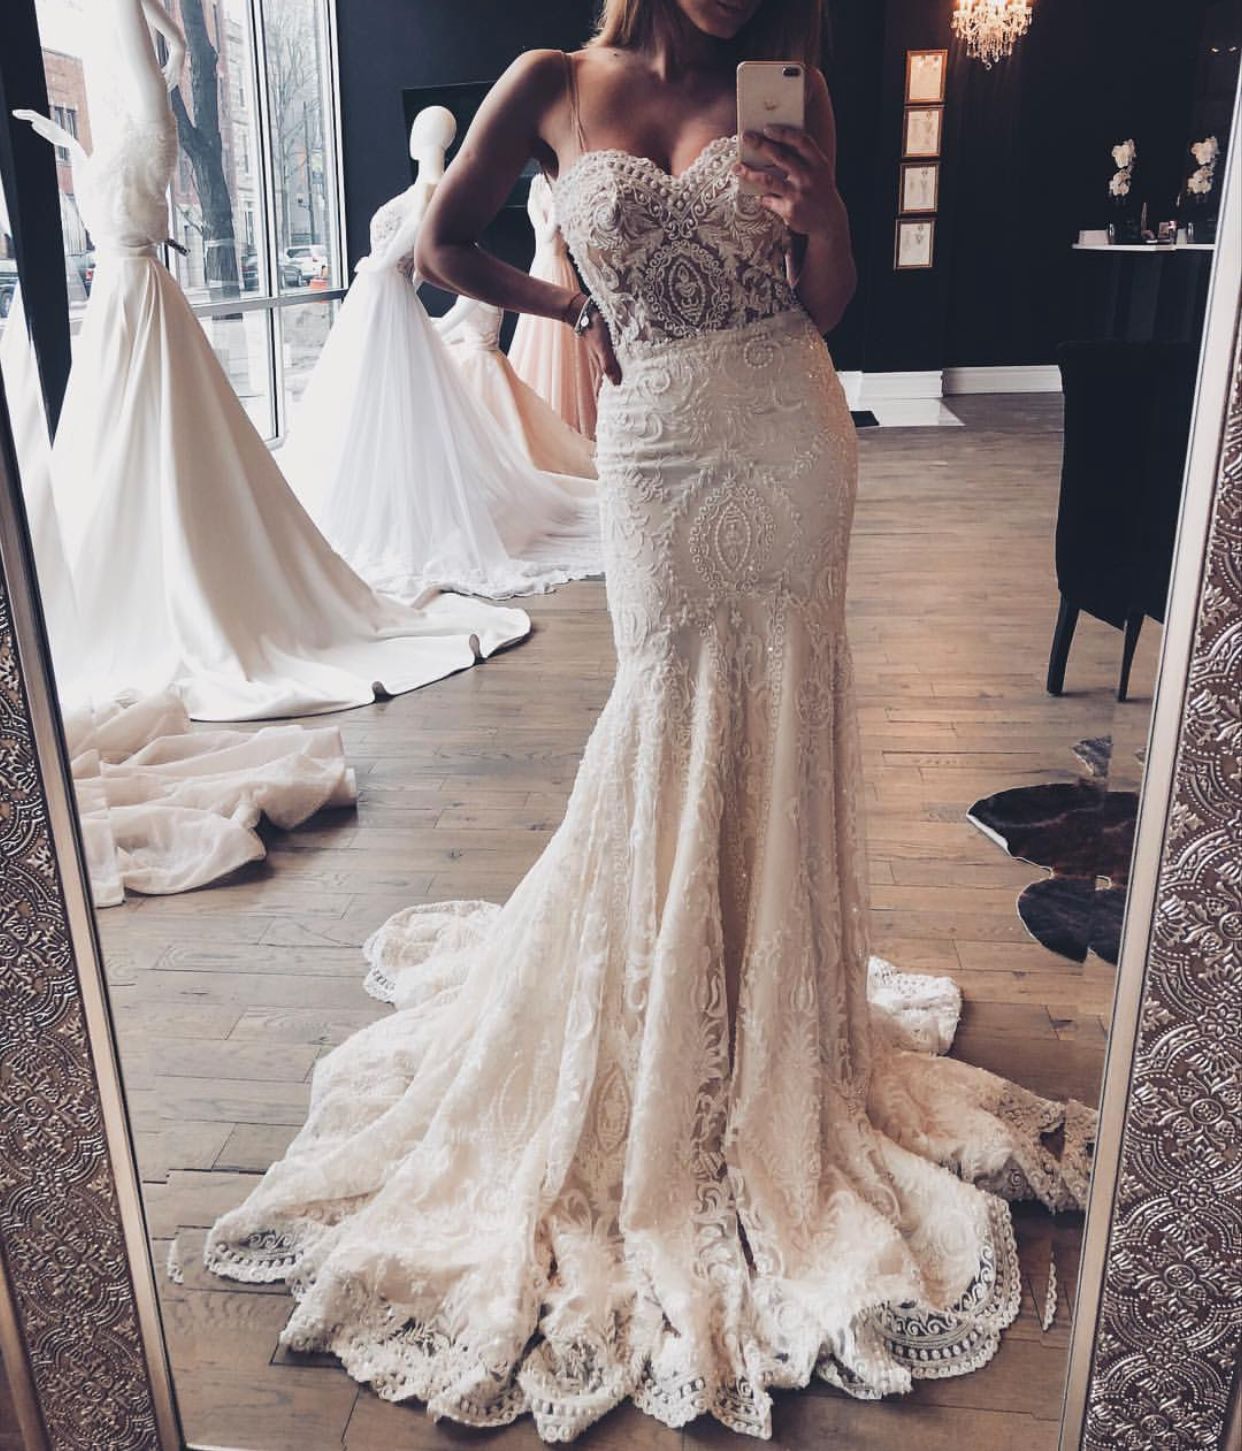 Randy fenoli wedding dresses  Lovinghautecouture  Just Wedding things  Pinterest  Wedding